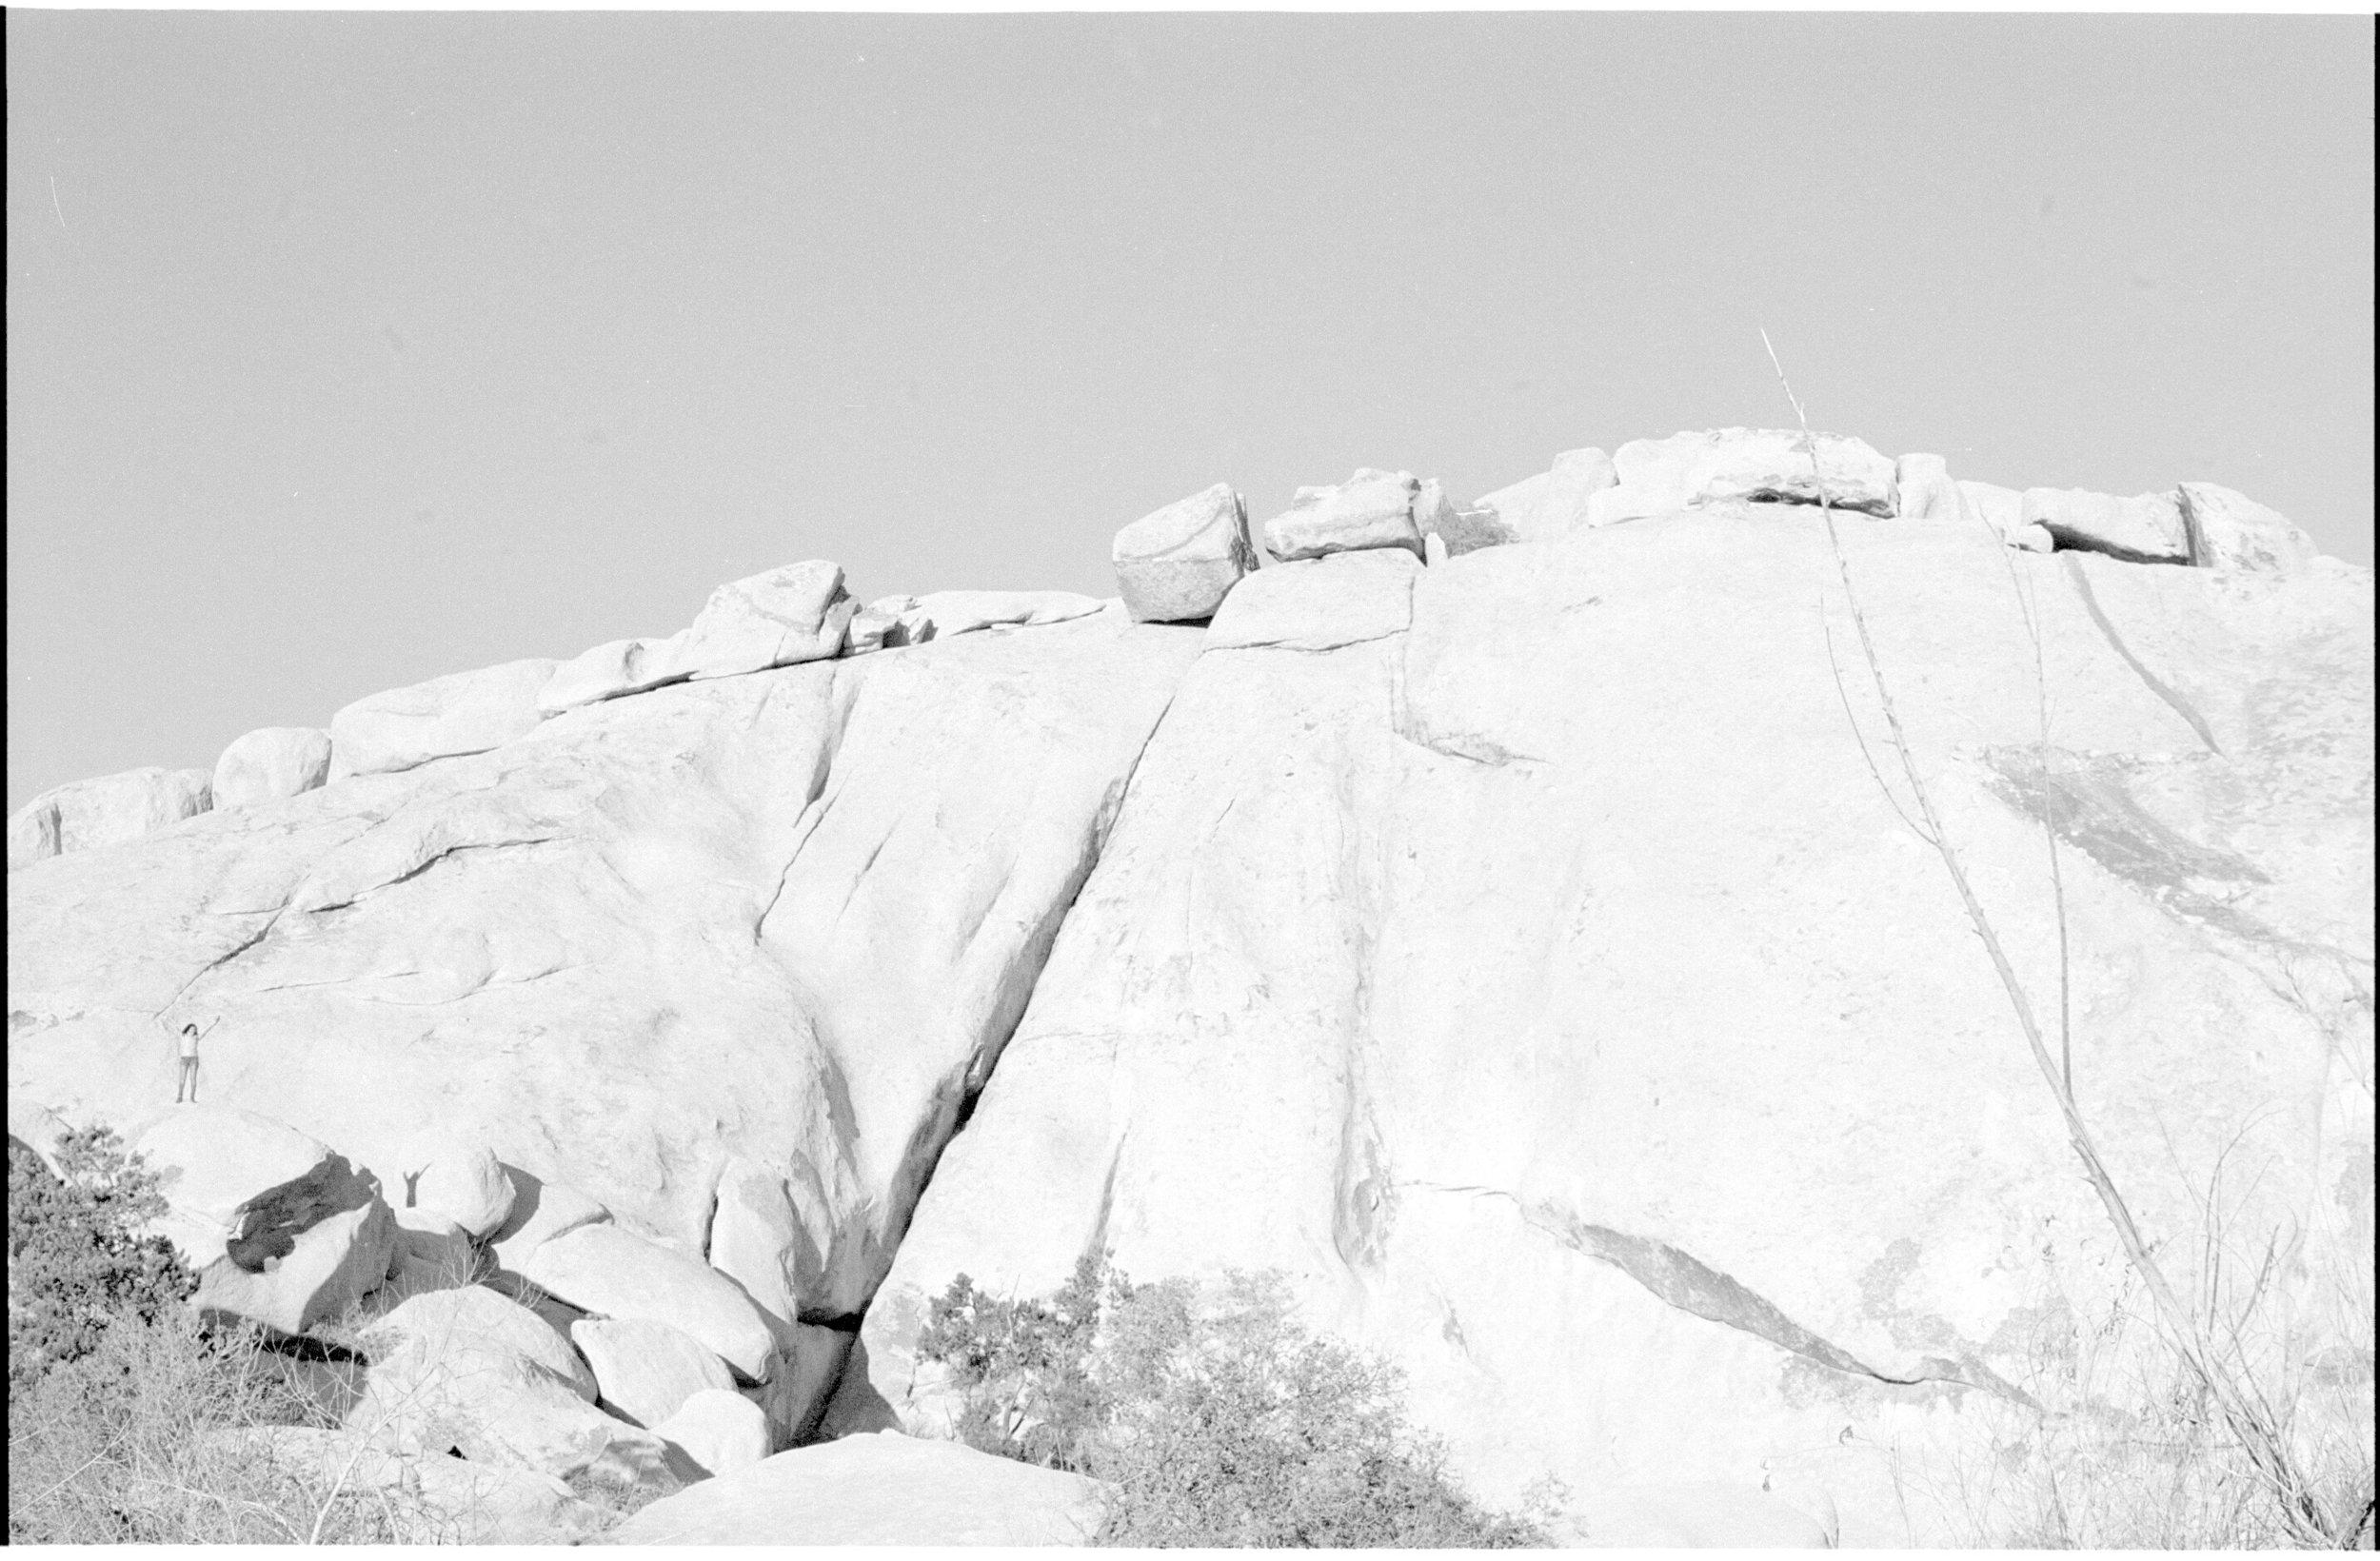 joshua tree, big rocks